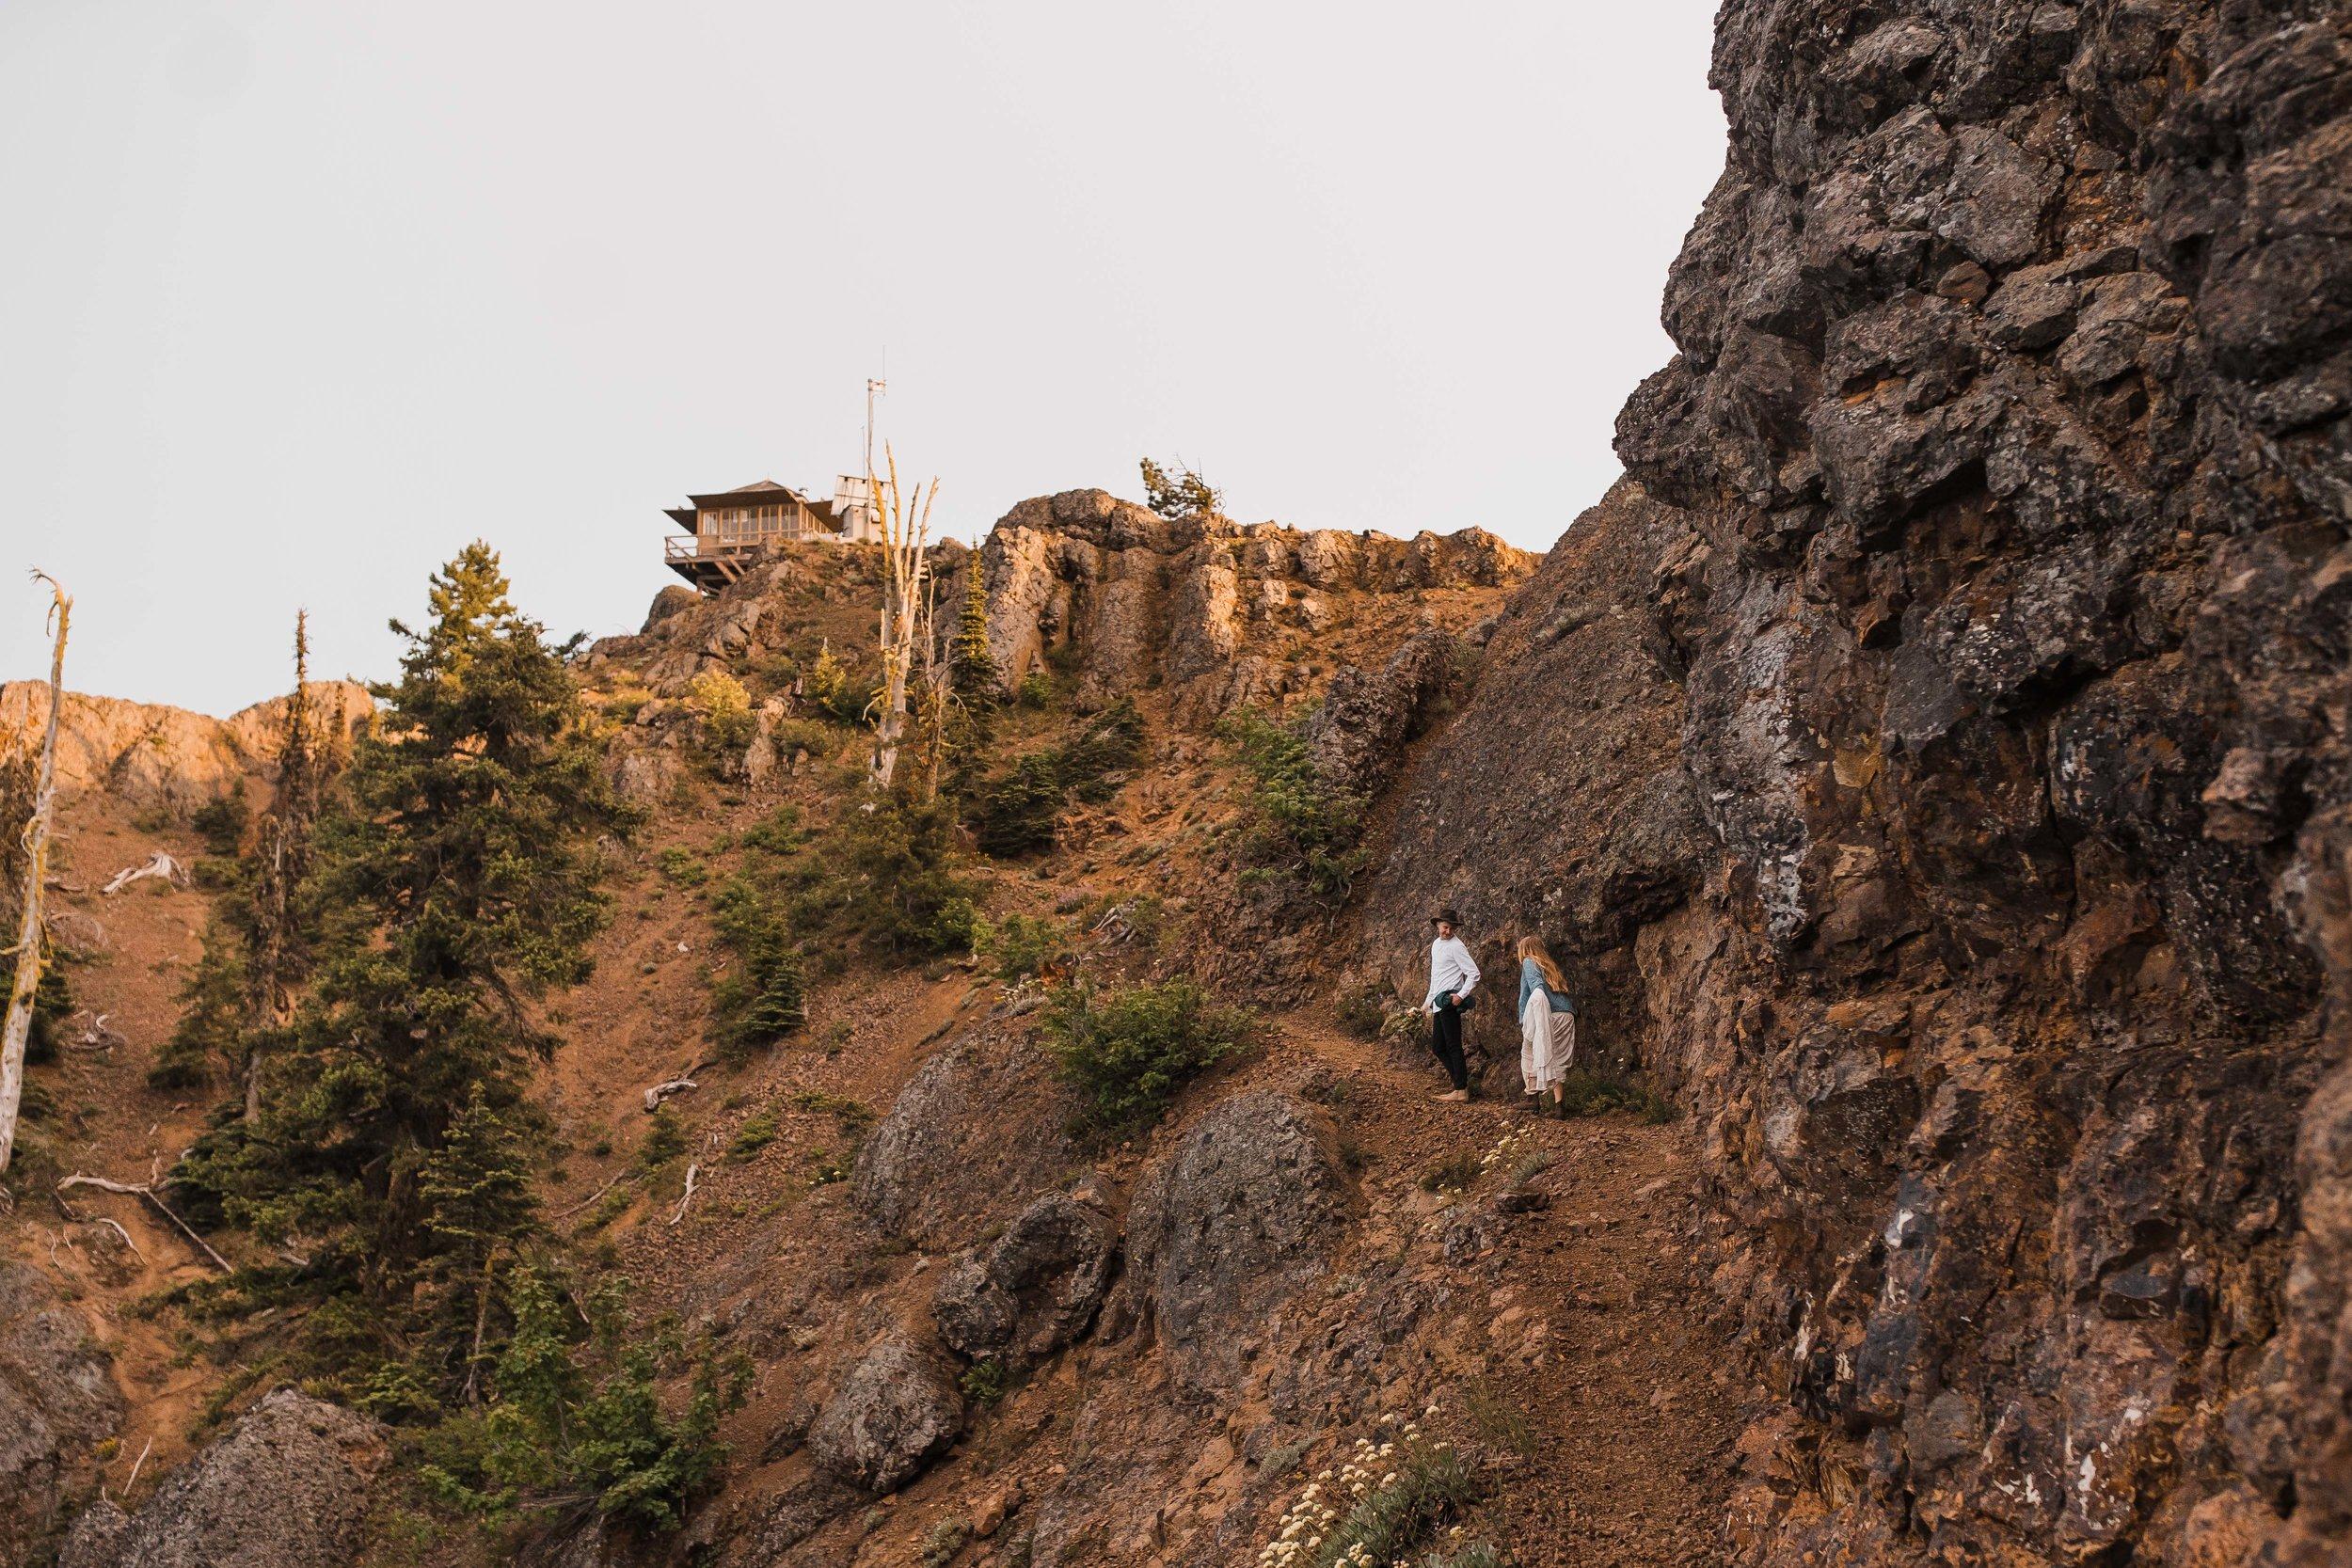 Washington Fire Lookout Elopement| Between the Pine Adventure Elopement Photography